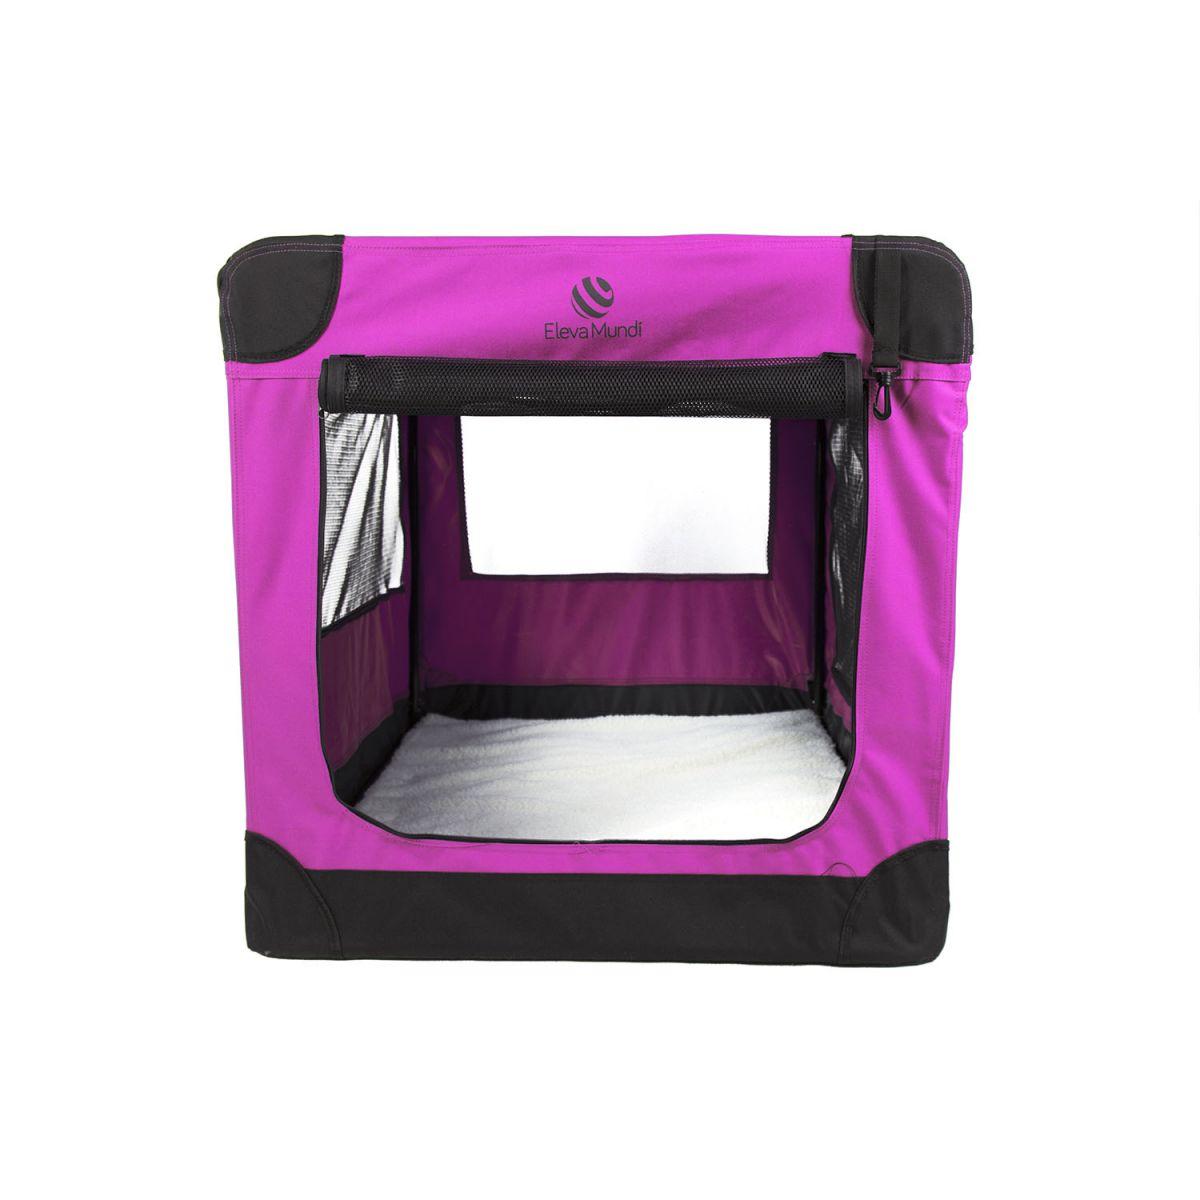 Casinha Móvel Dobrável Pet Holiday Tamanho XG Eleva Mundi - Rosa